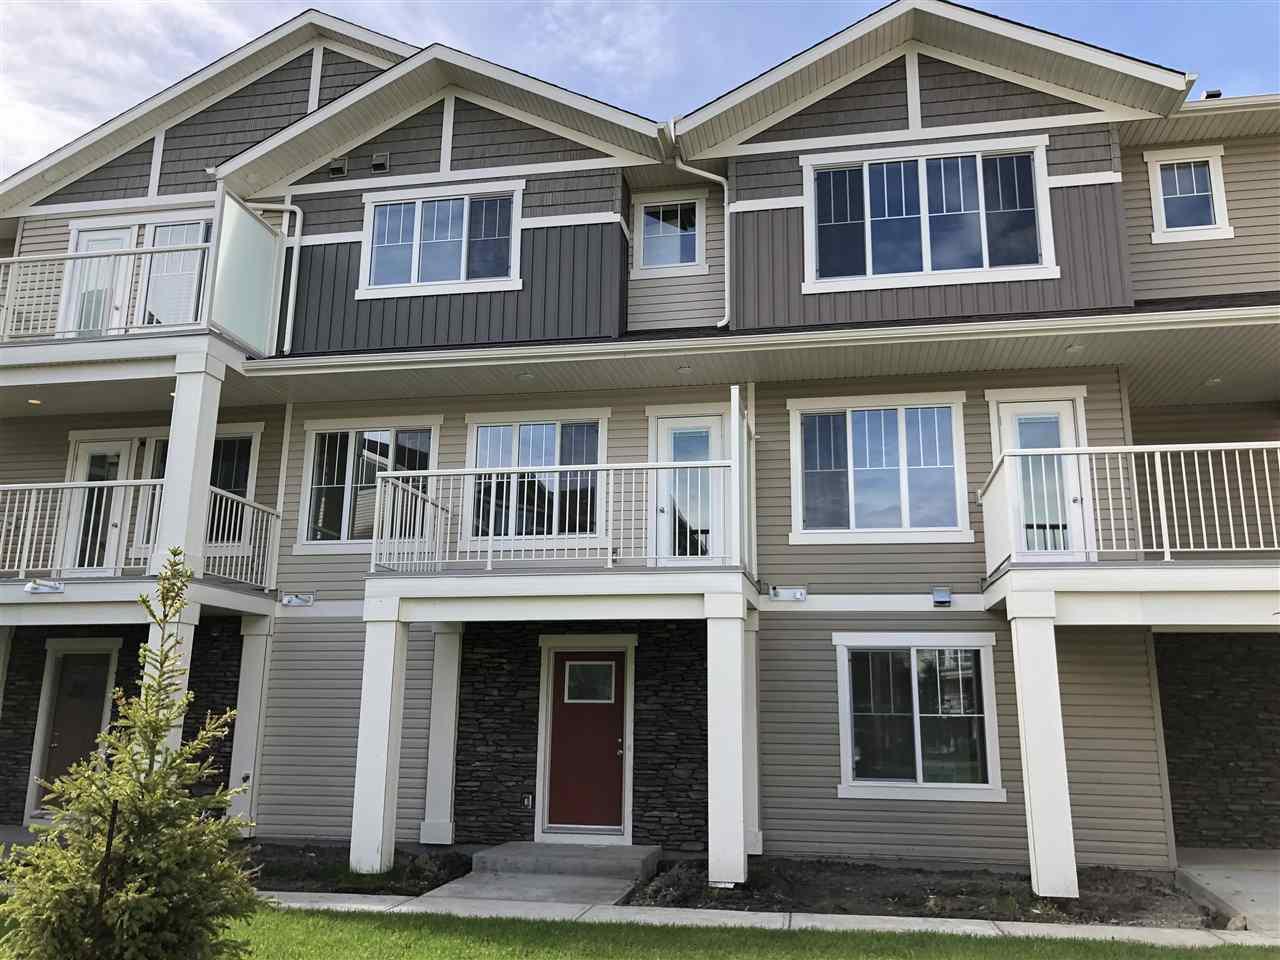 Main Photo: 2 17832 78 Street in Edmonton: Zone 28 Townhouse for sale : MLS®# E4204103